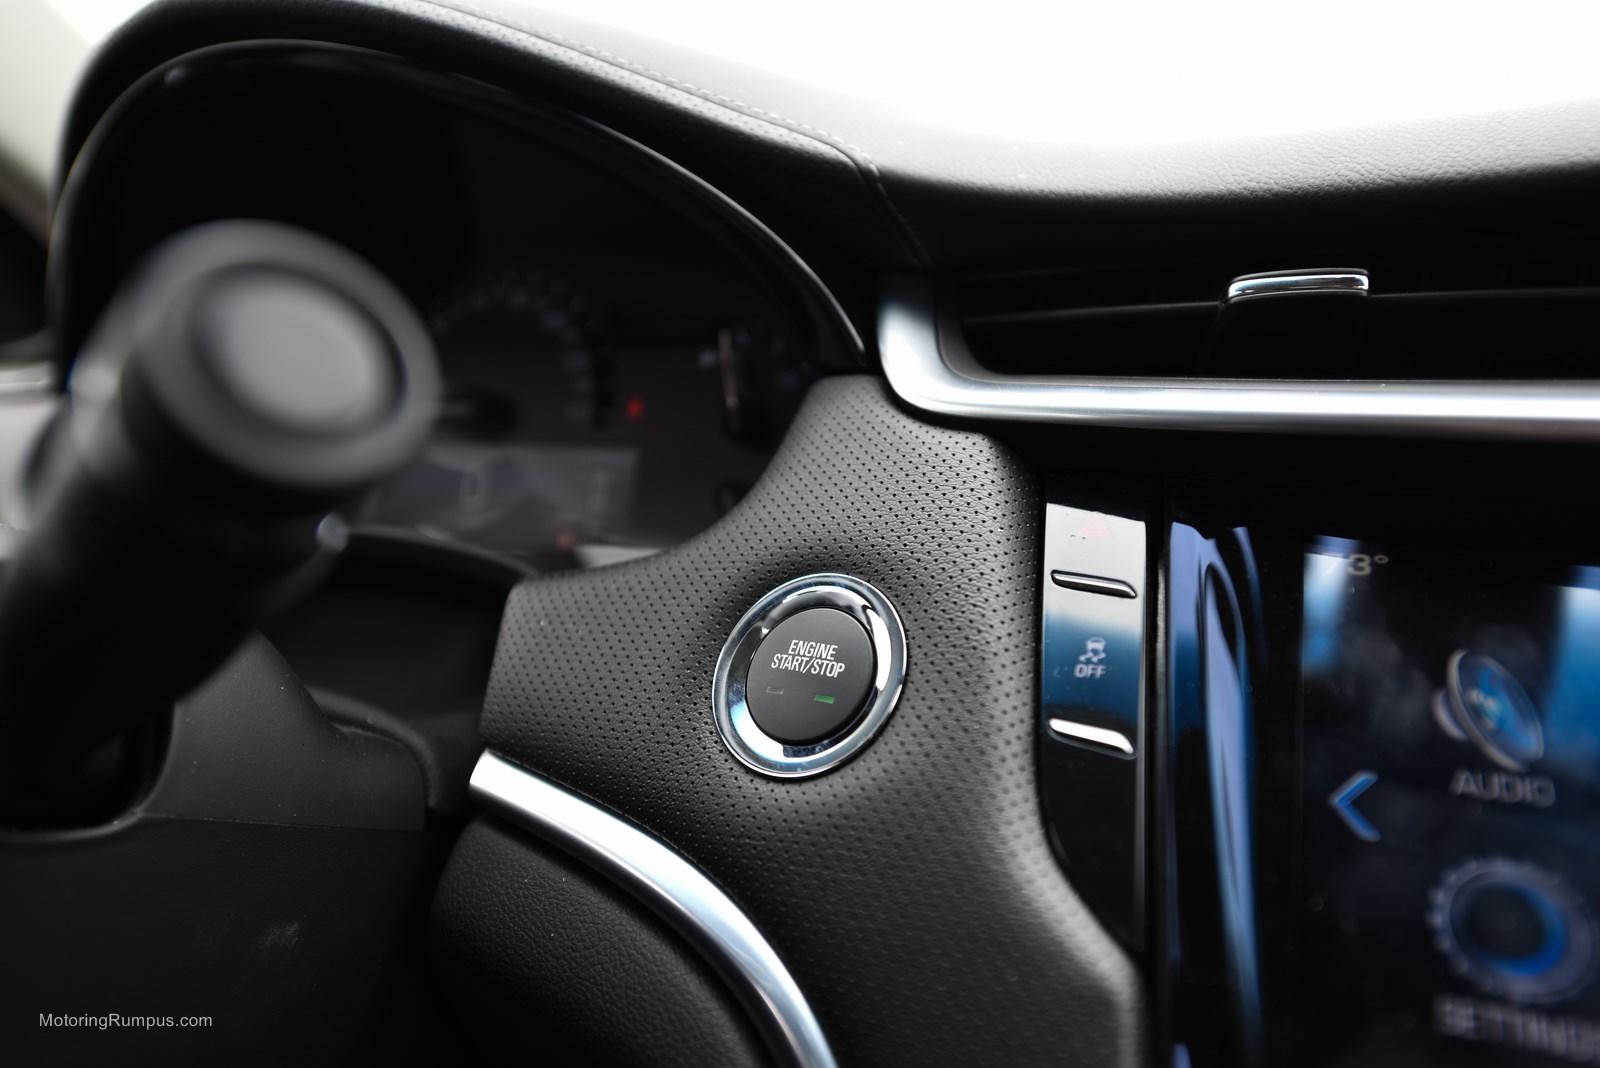 2014 Cadillac XTS Start Button